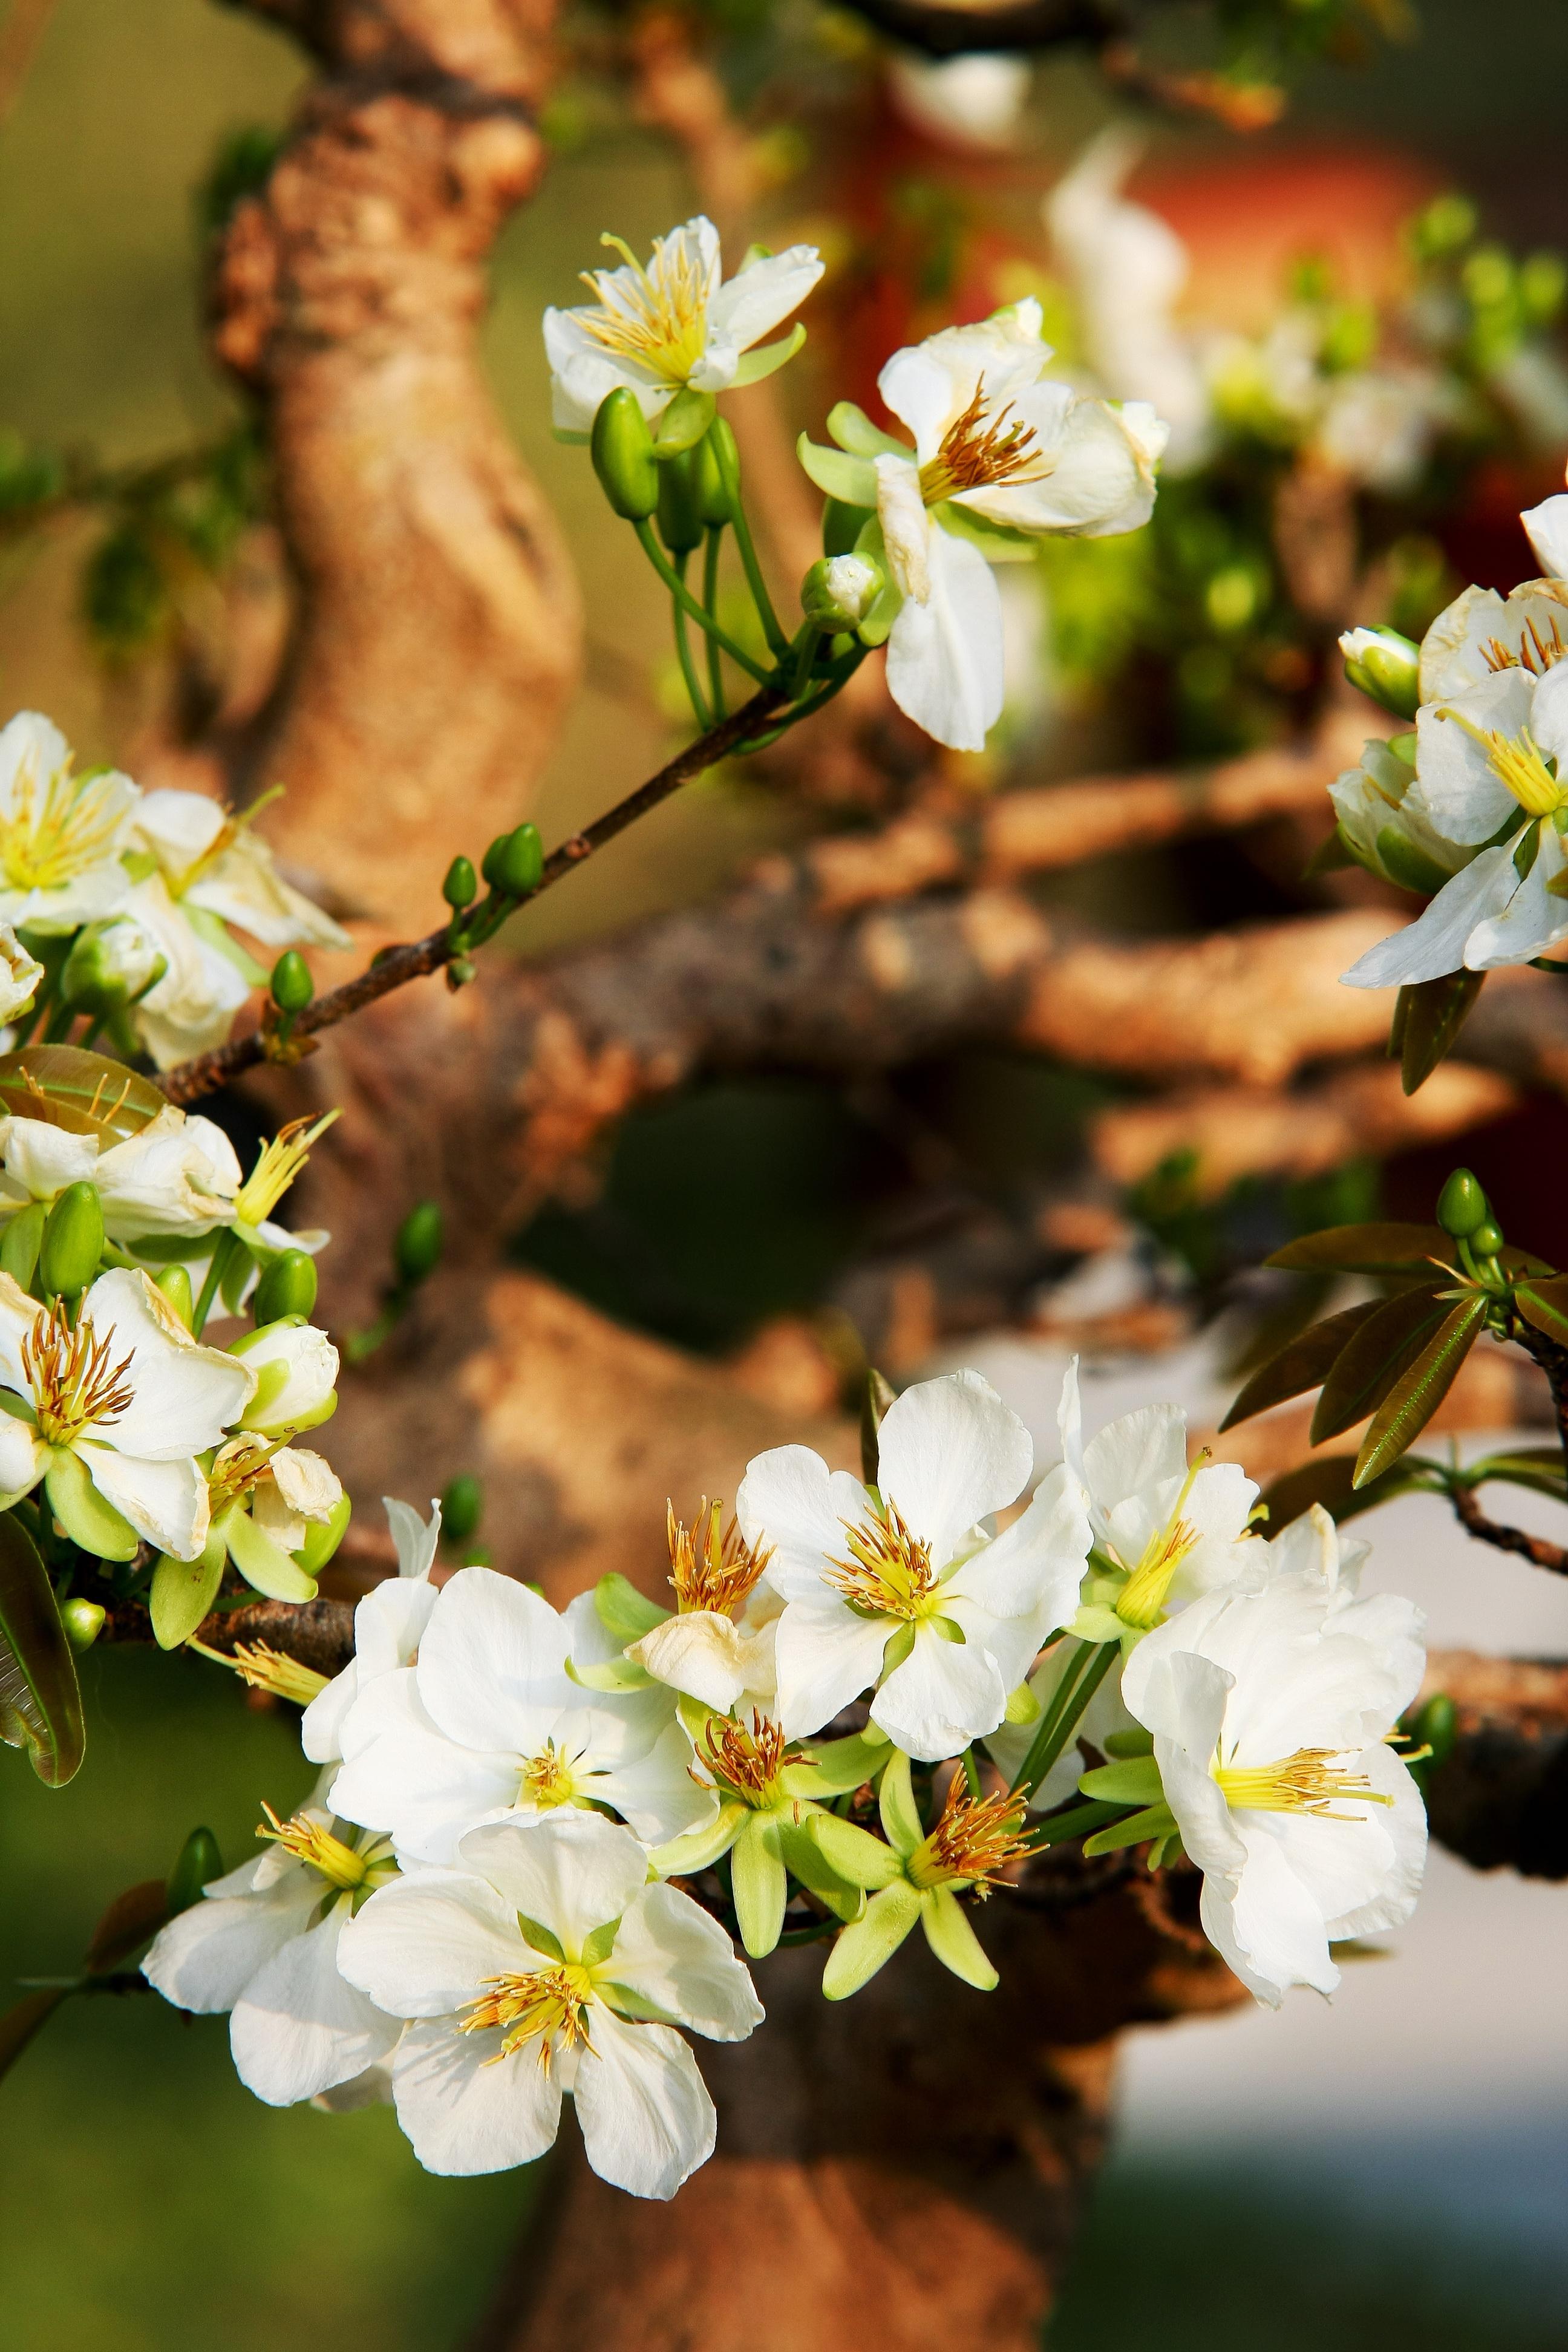 Free Images : tree, nature, branch, blossom, sunlight, leaf, flower ...